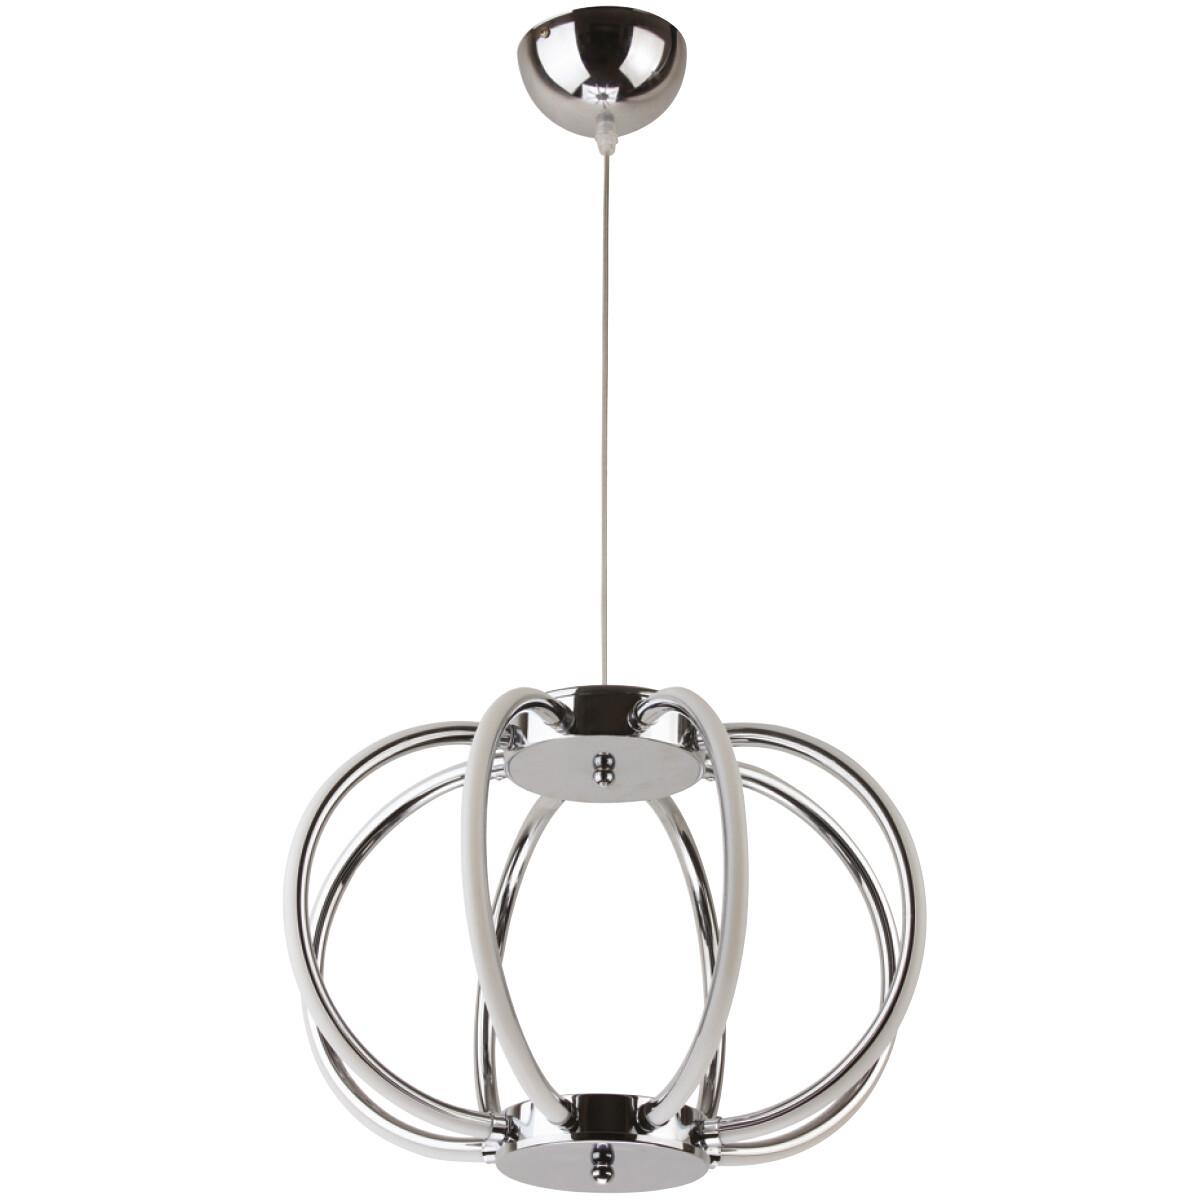 LED Hanglamp - Phoeny - Industrieel - 38W - Natuurlijk Wit 4000K - Rond - Glans Chroom Aluminium